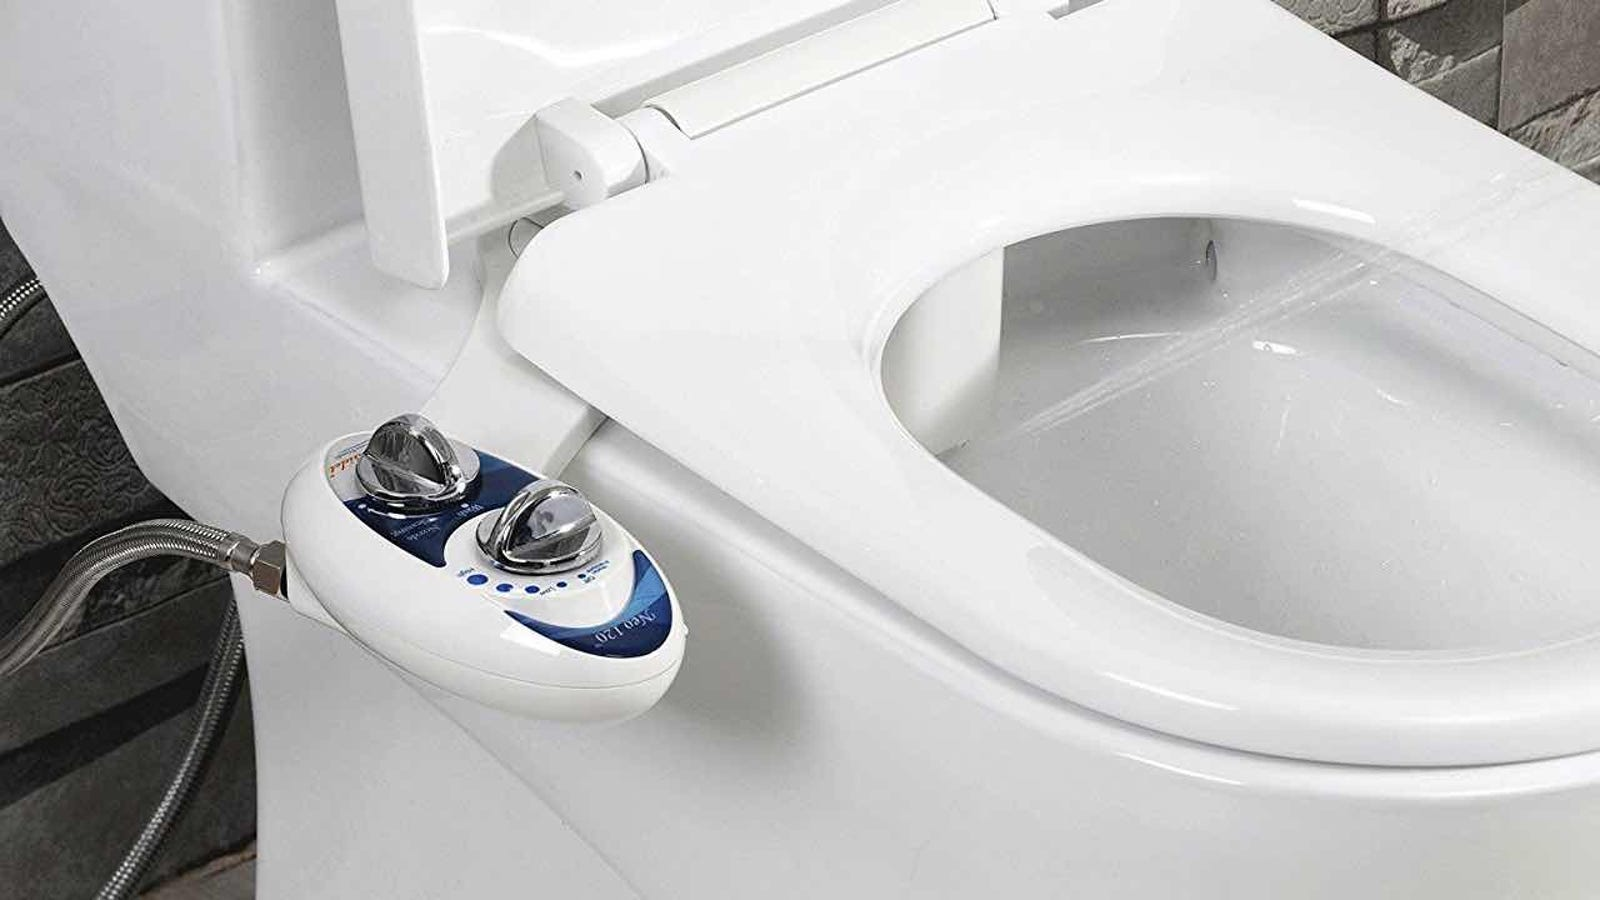 Sensational Amazon Bidet Pdpeps Interior Chair Design Pdpepsorg